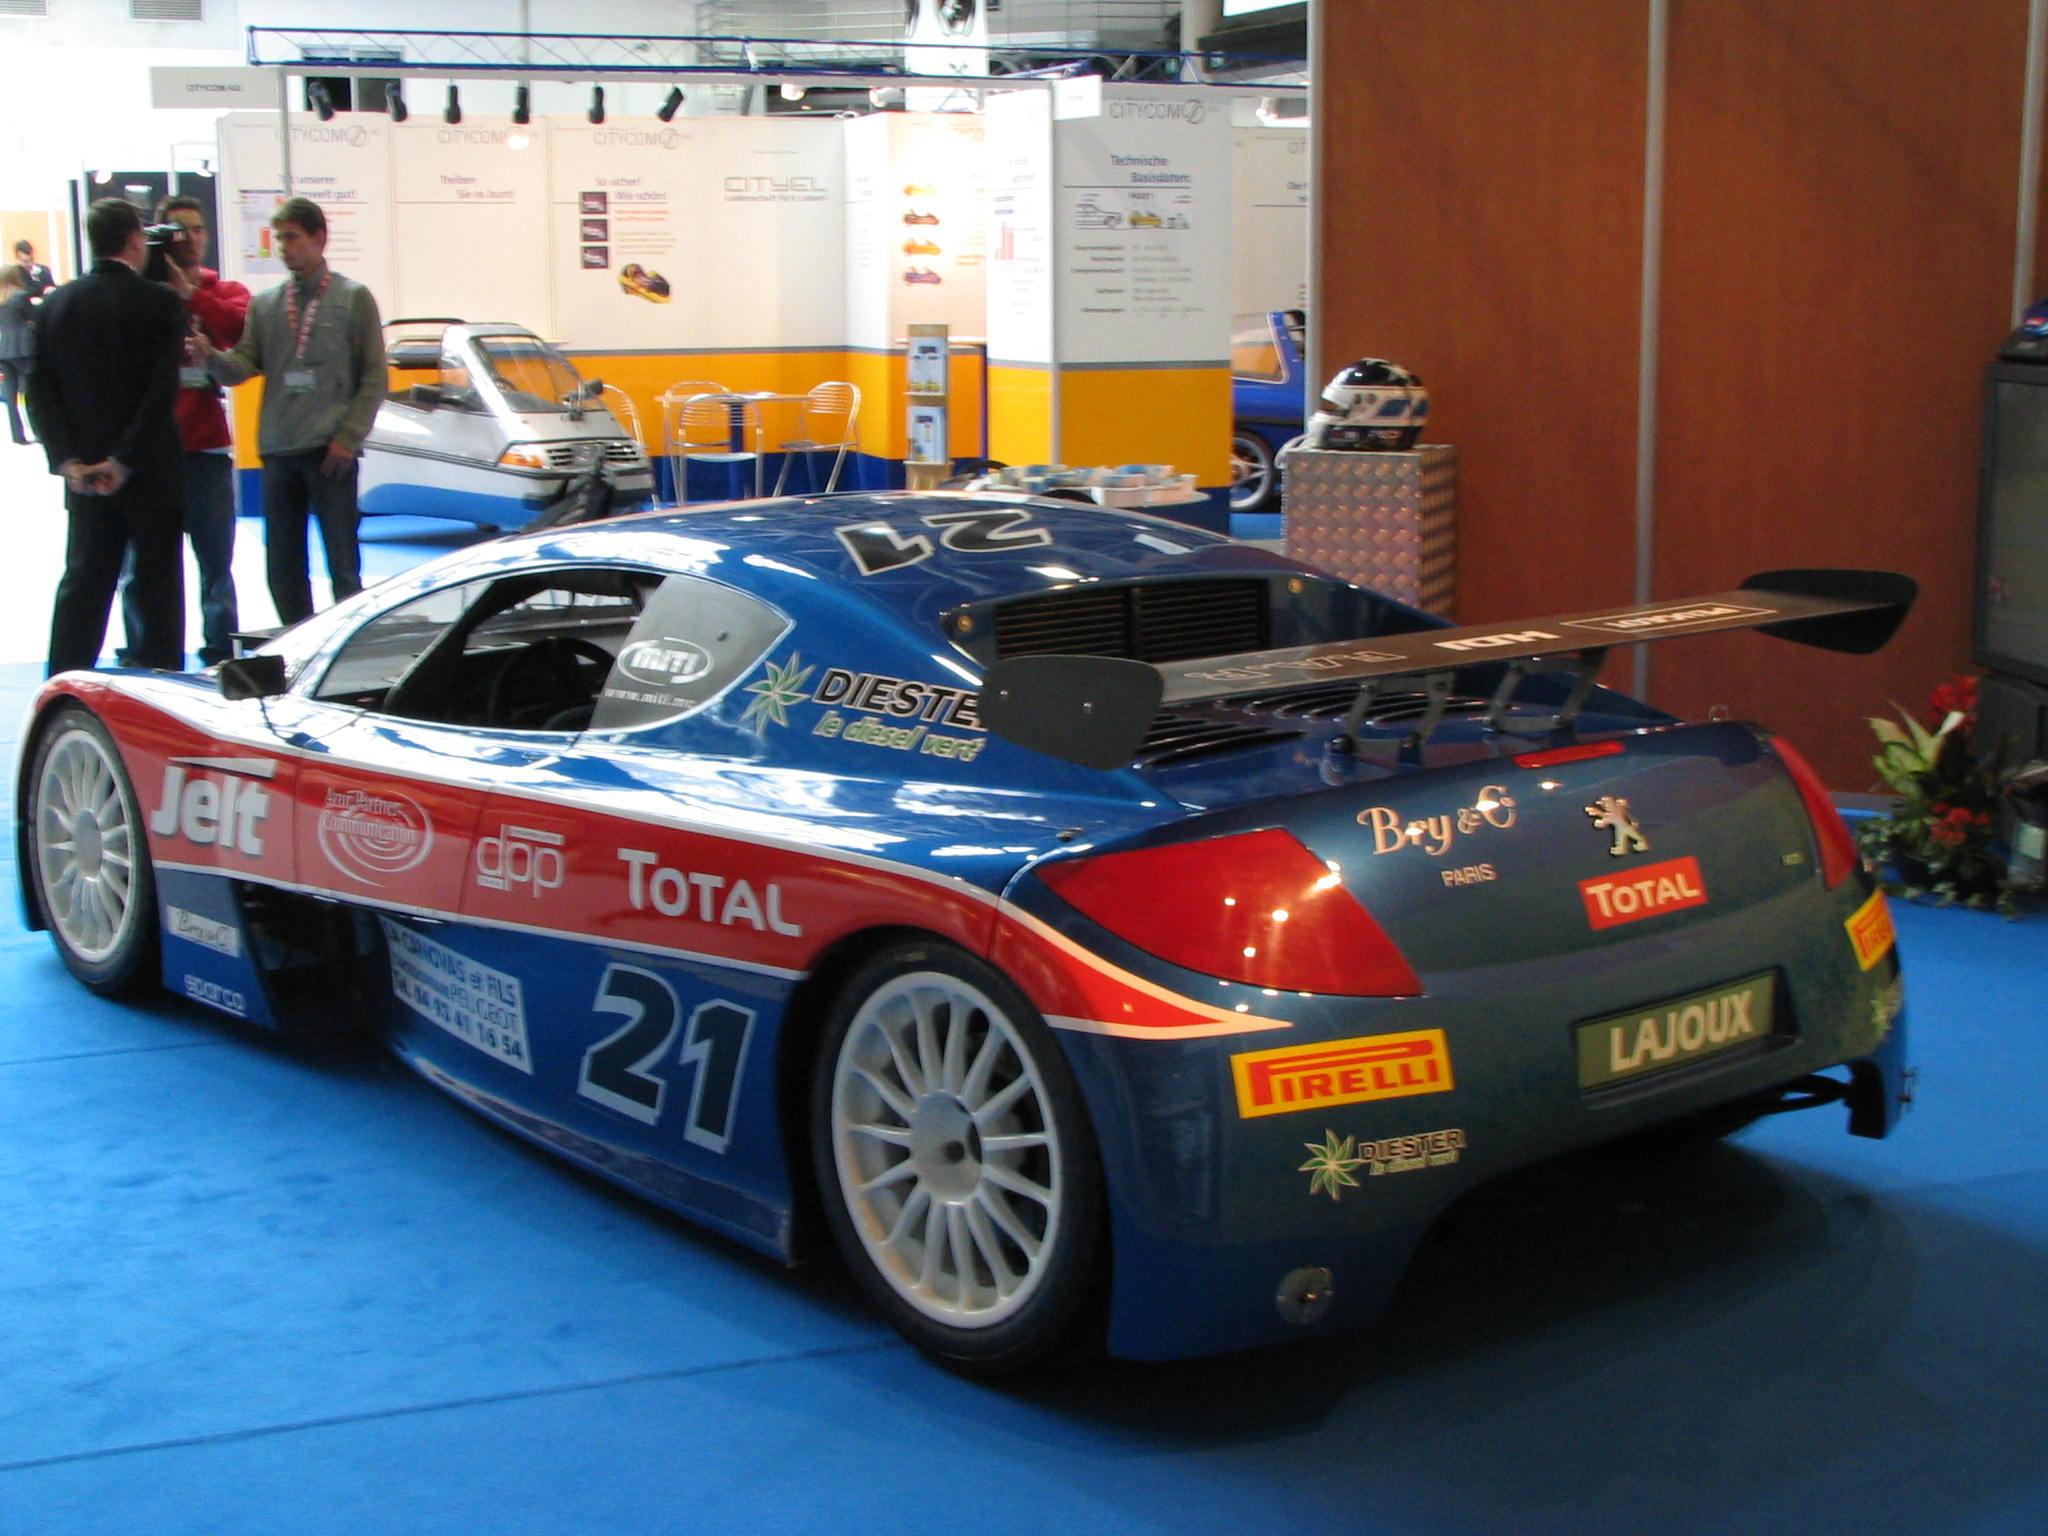 Biodiesel racing cars